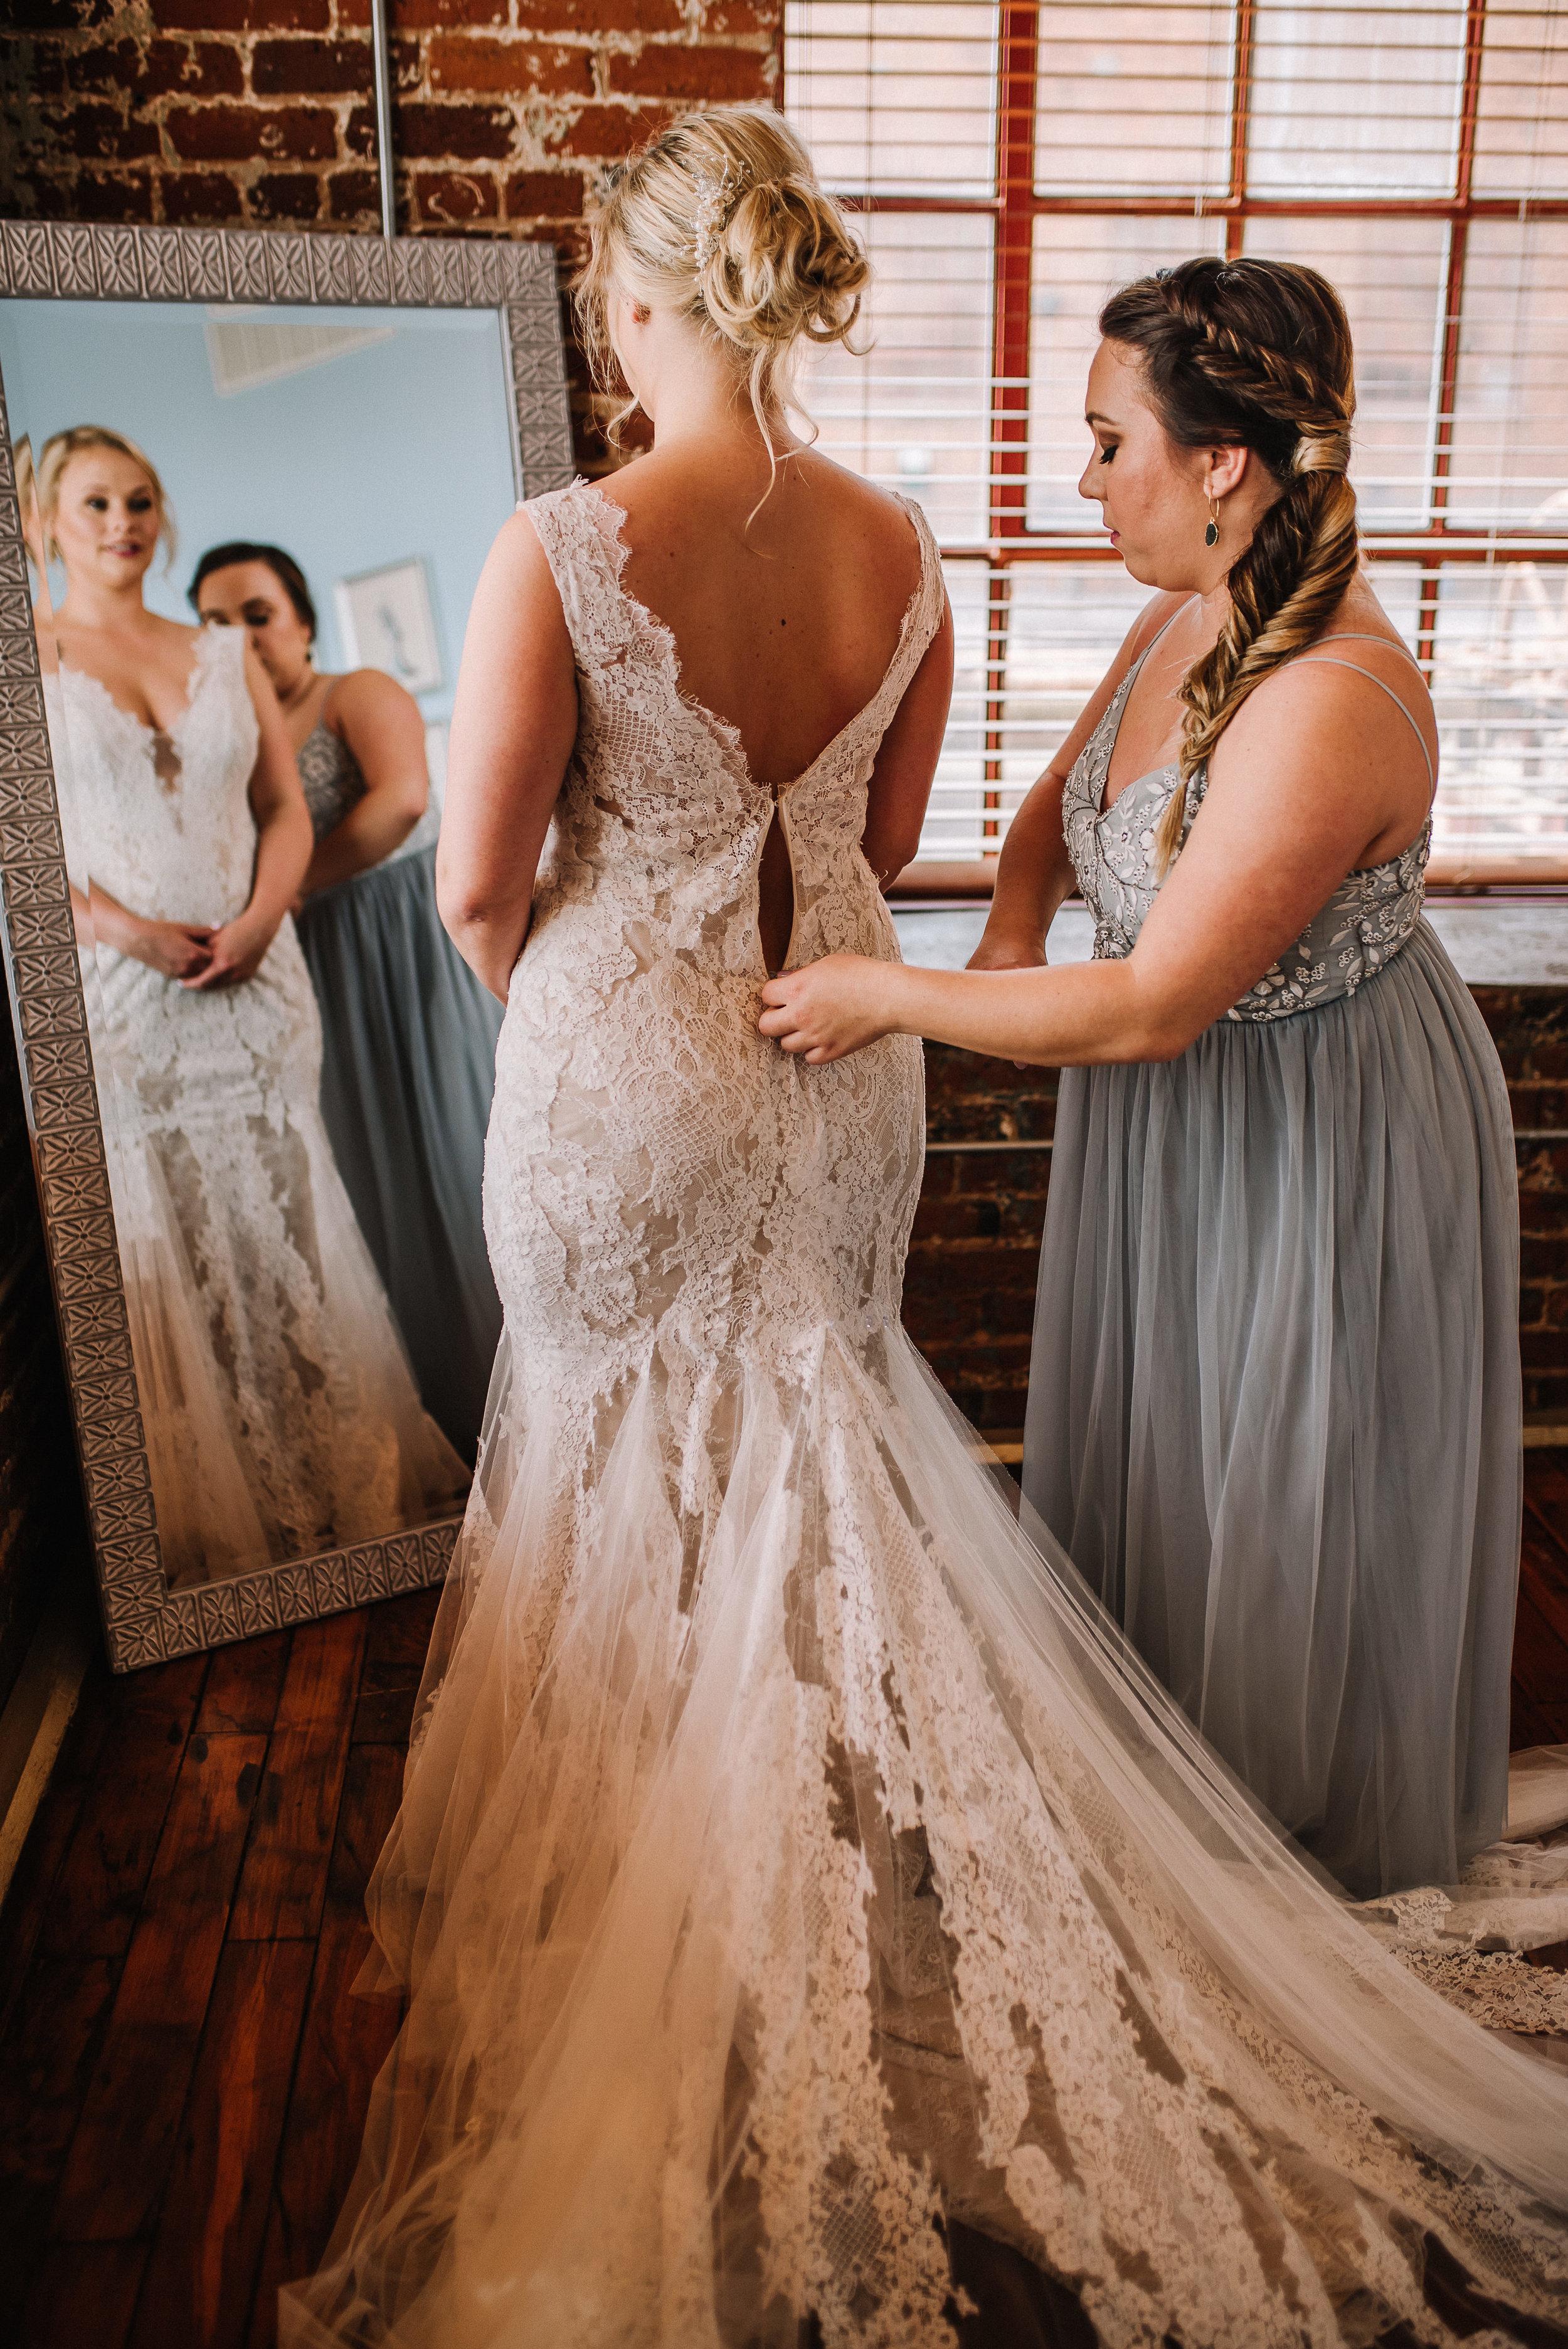 Morgan Wedding_Mill at Yellow River_Ashley Benham Photography-216.jpg